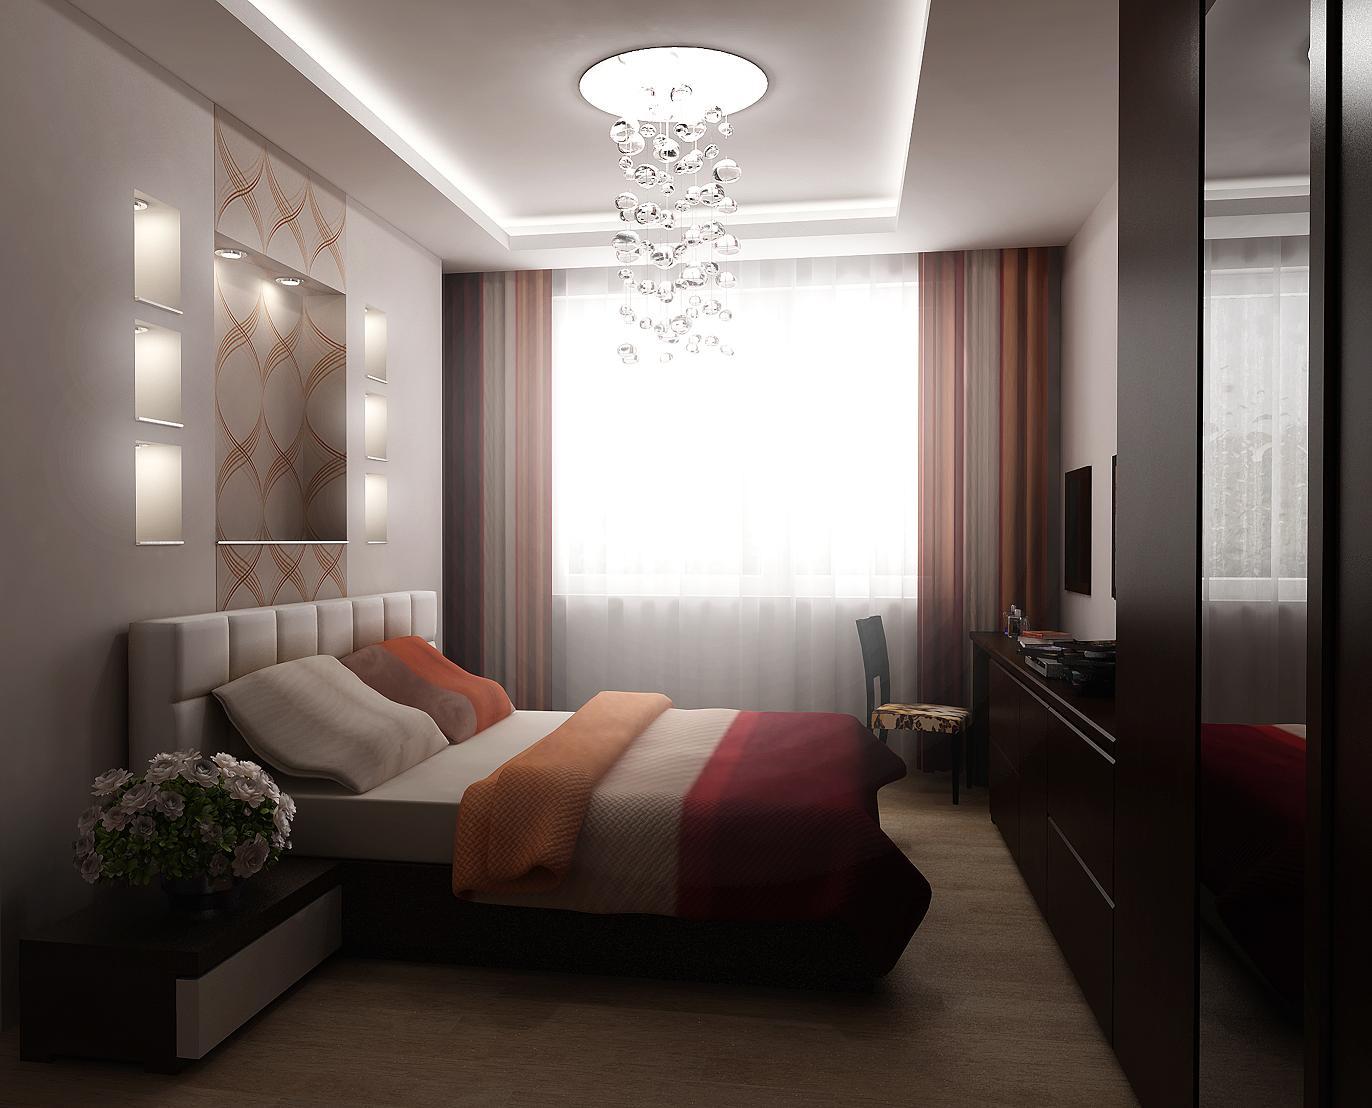 дизайн узкой спальни фото 12 кв.м